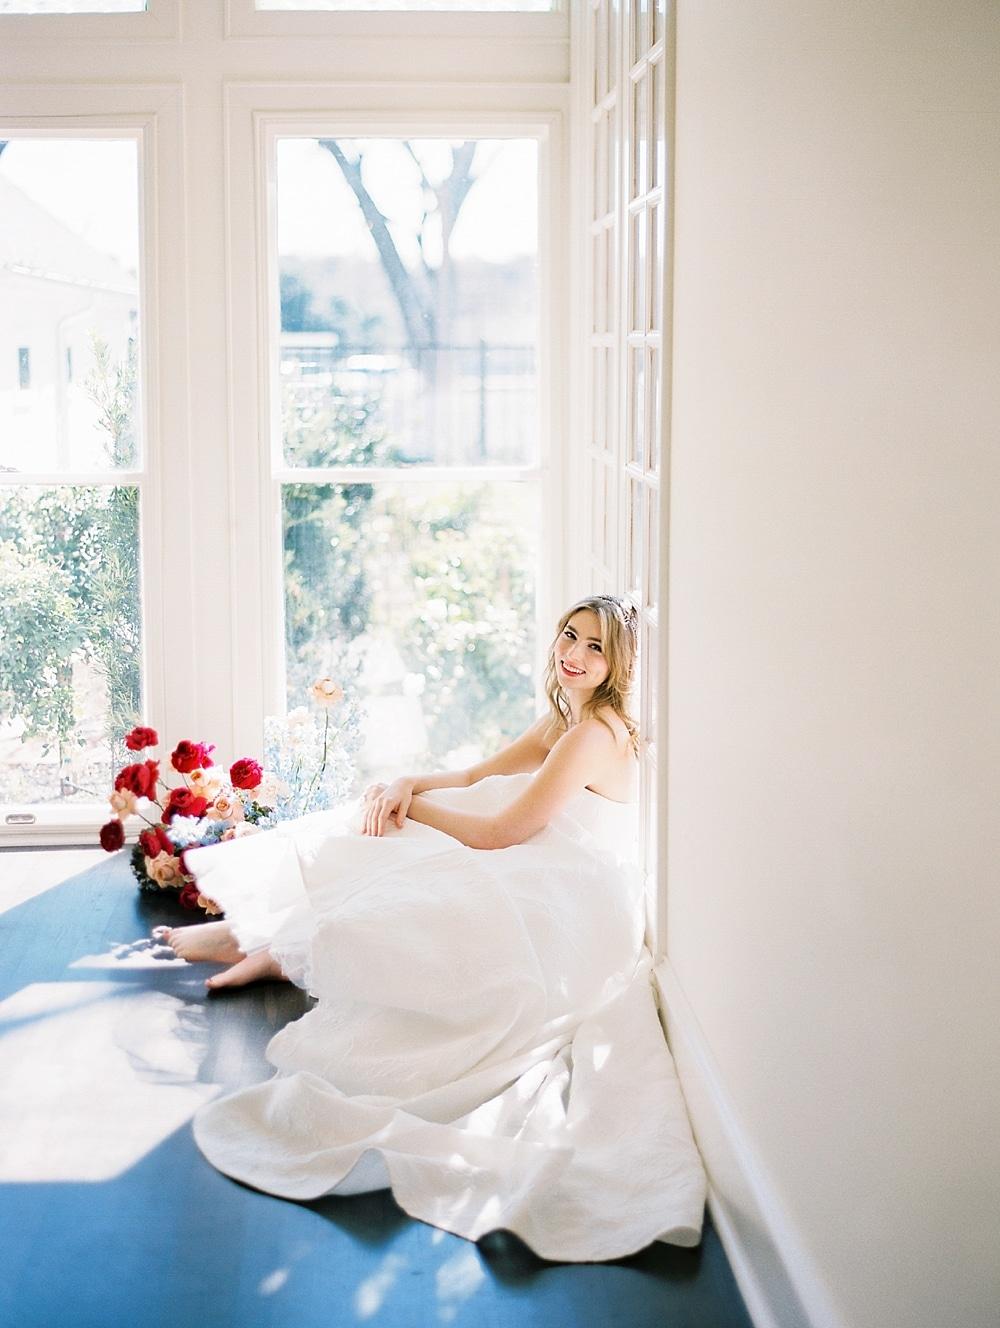 kristin-la-voie-photography-austin-wedding-photographer-woodbine-mansion-19